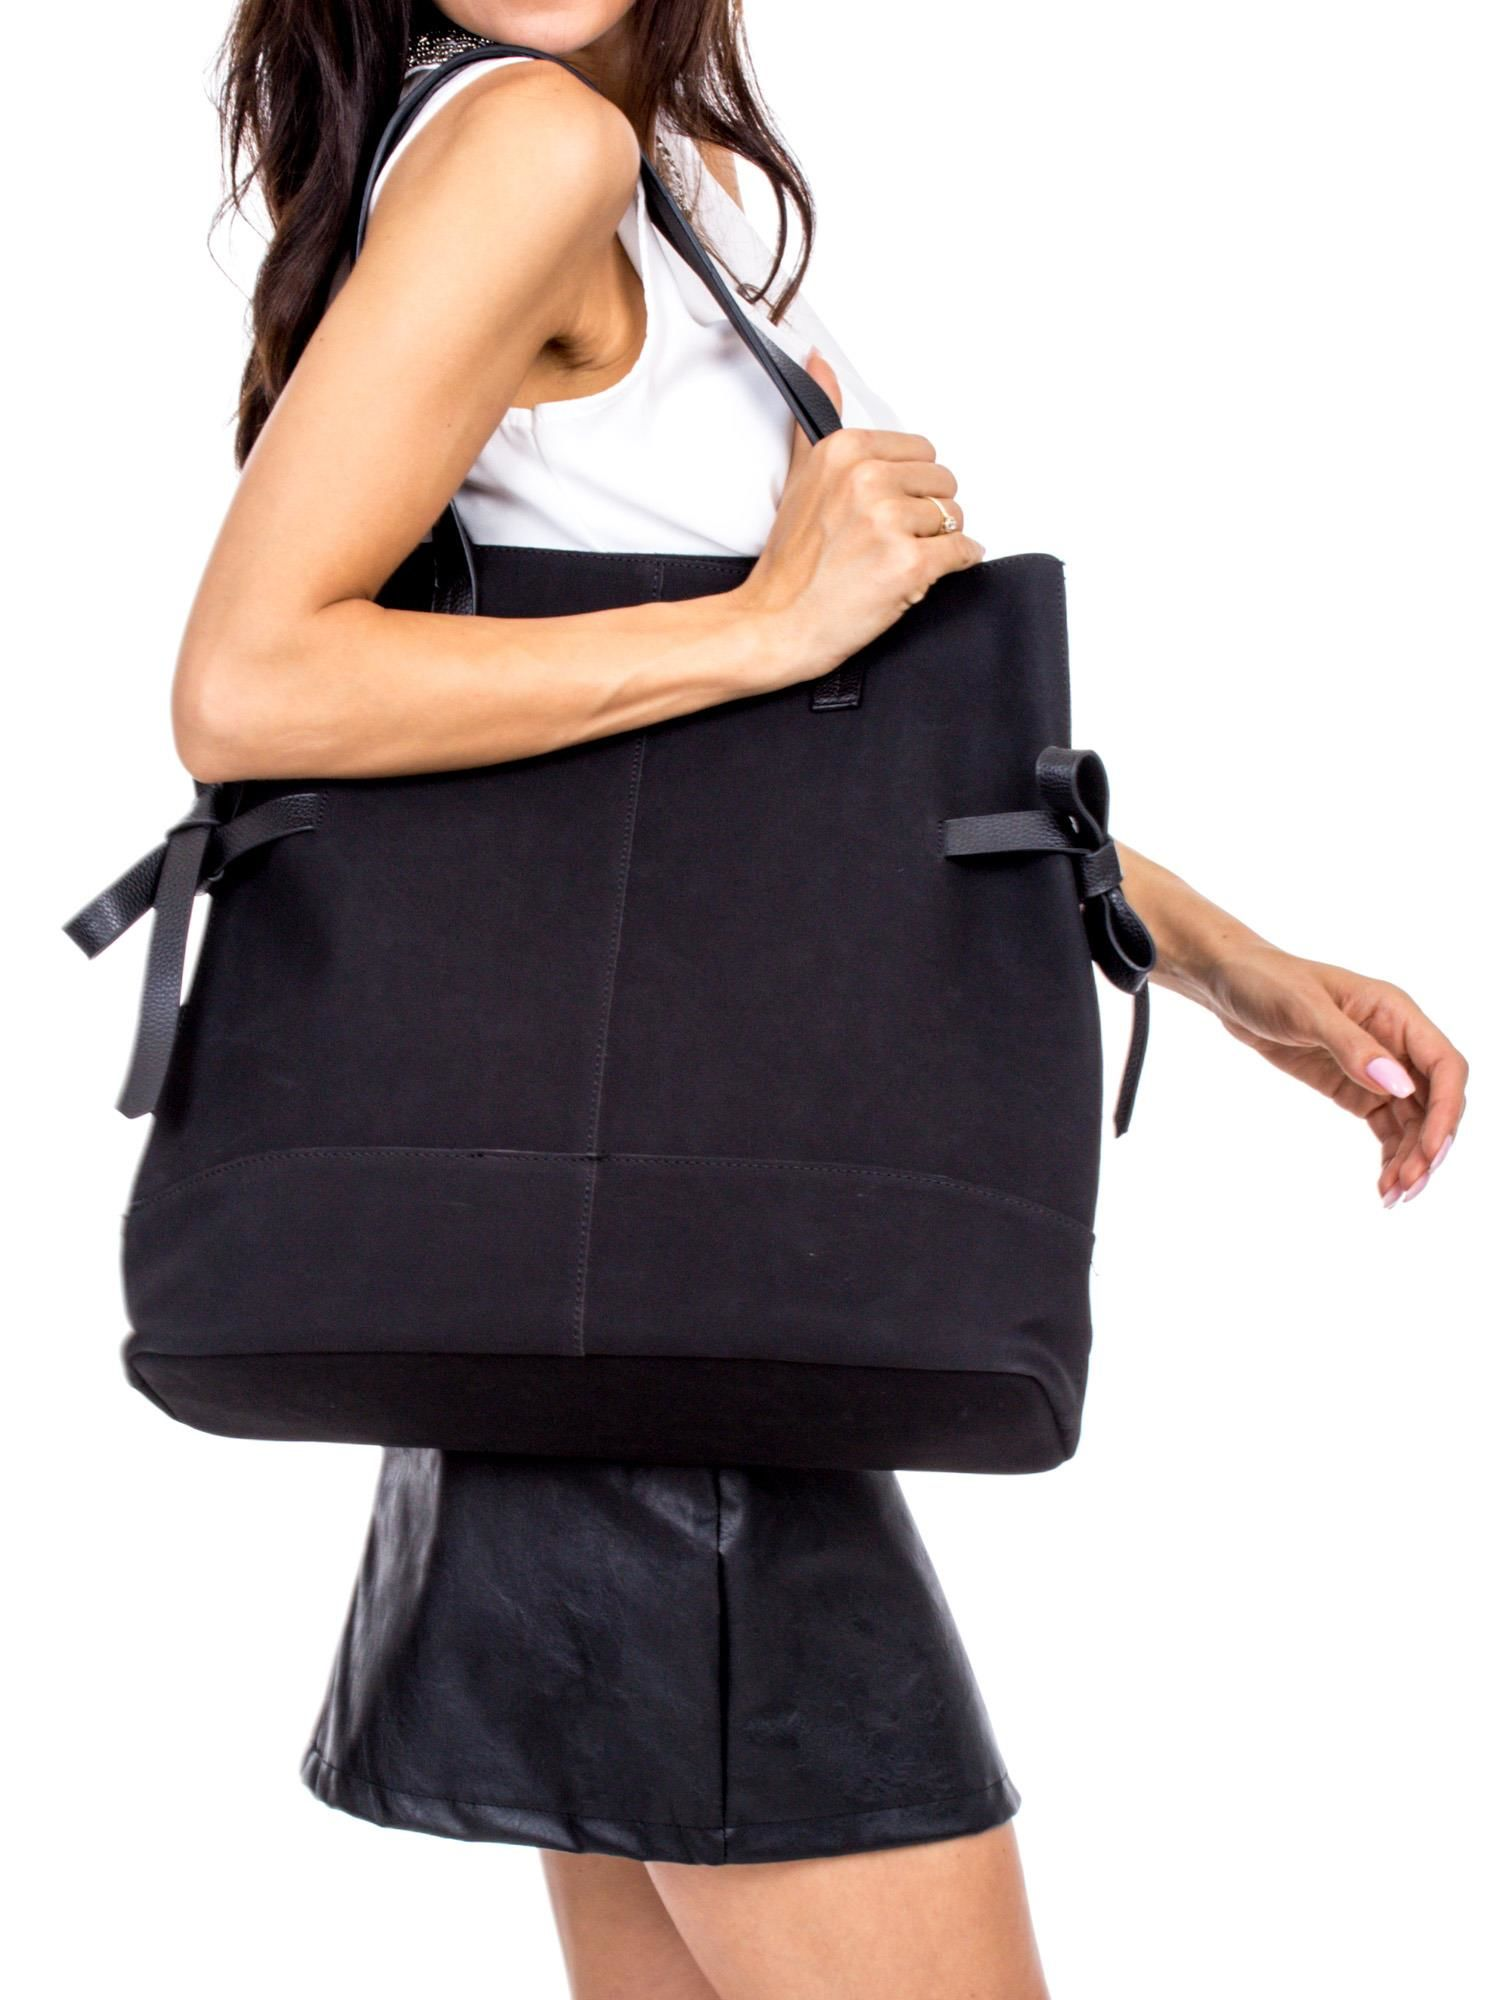 6af0081868ea8 Czarna torba miejska z kokardkami - Akcesoria torba - sklep eButik.pl